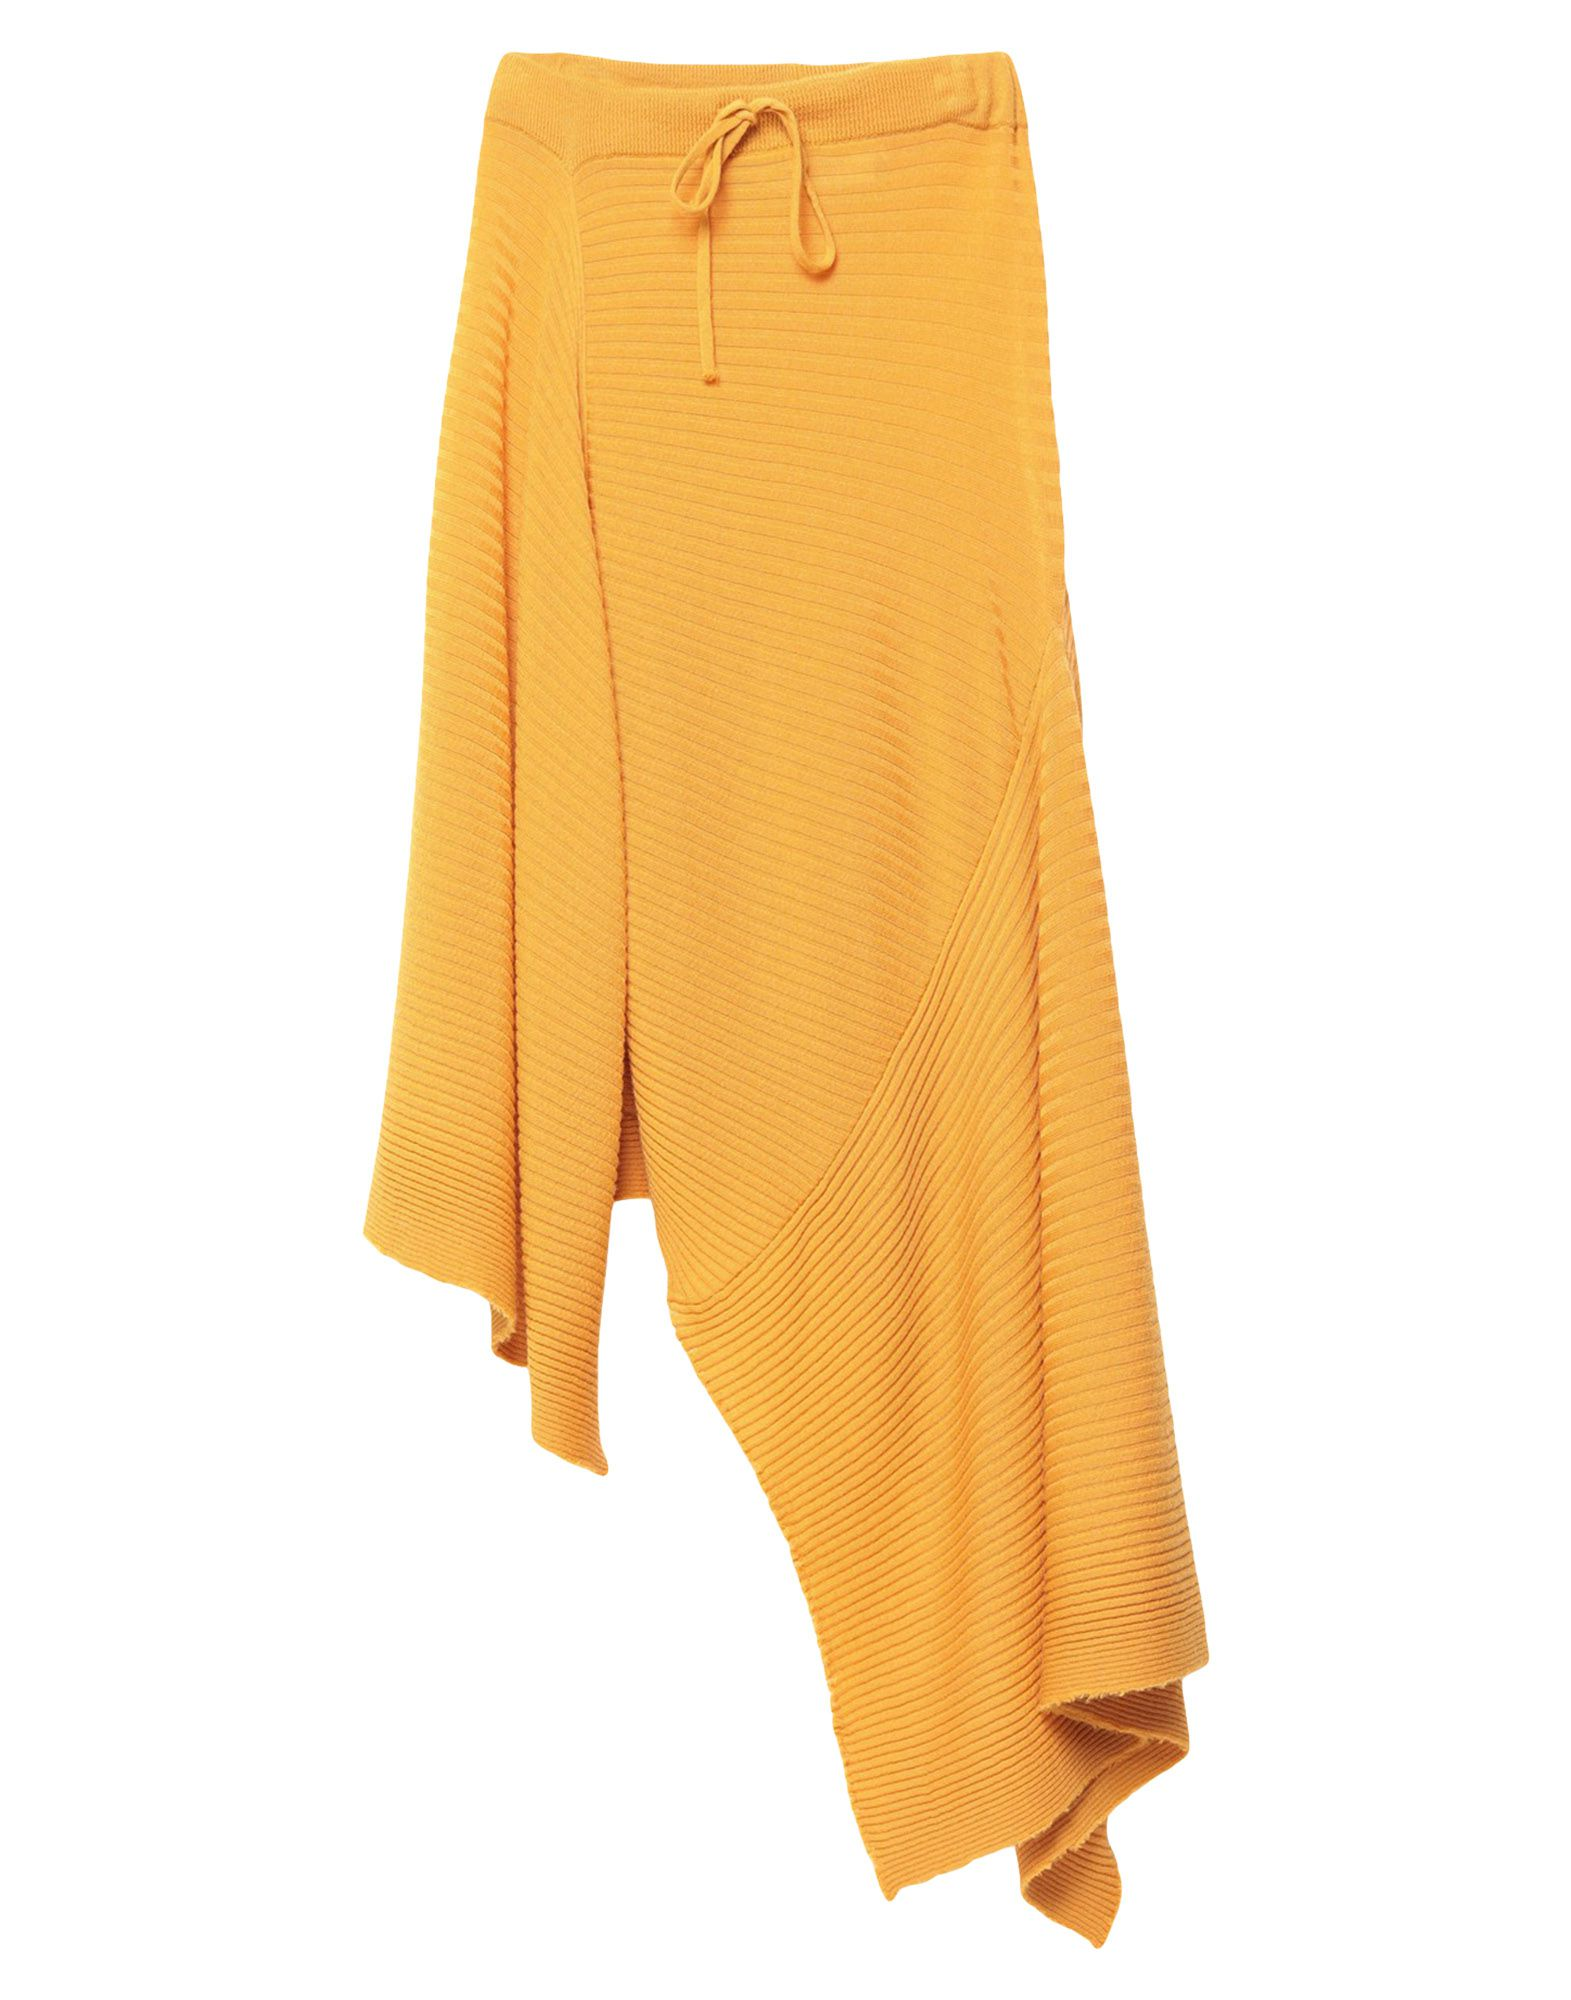 MARQUES' ALMEIDA Юбка длиной 3/4 marques almeida юбка длиной 3 4